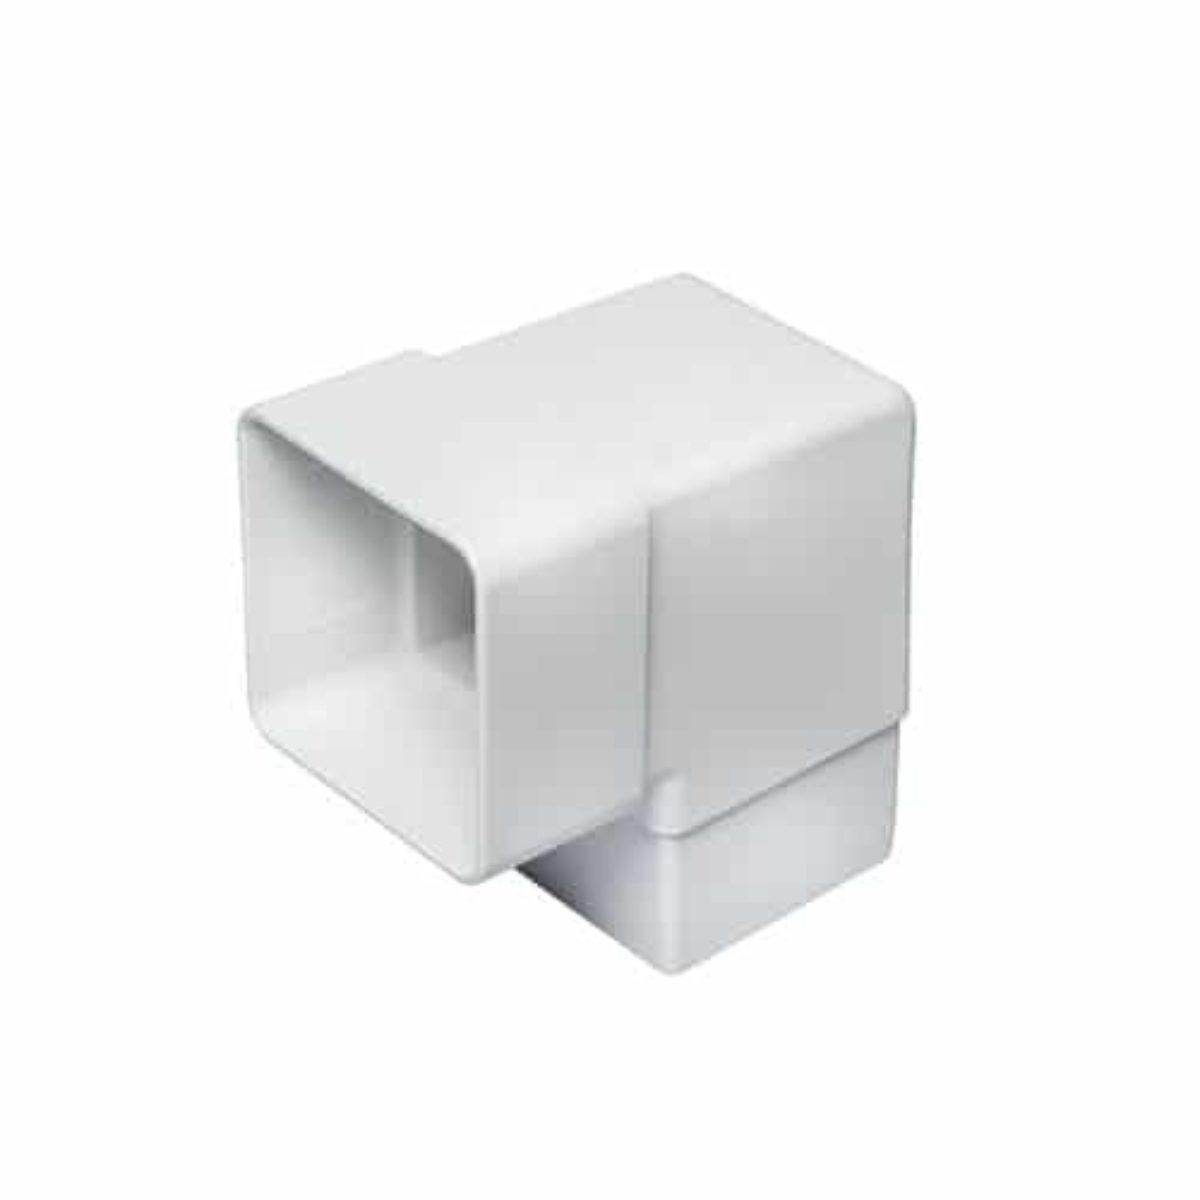 Square Line Gutter 114mm White Pack of 6